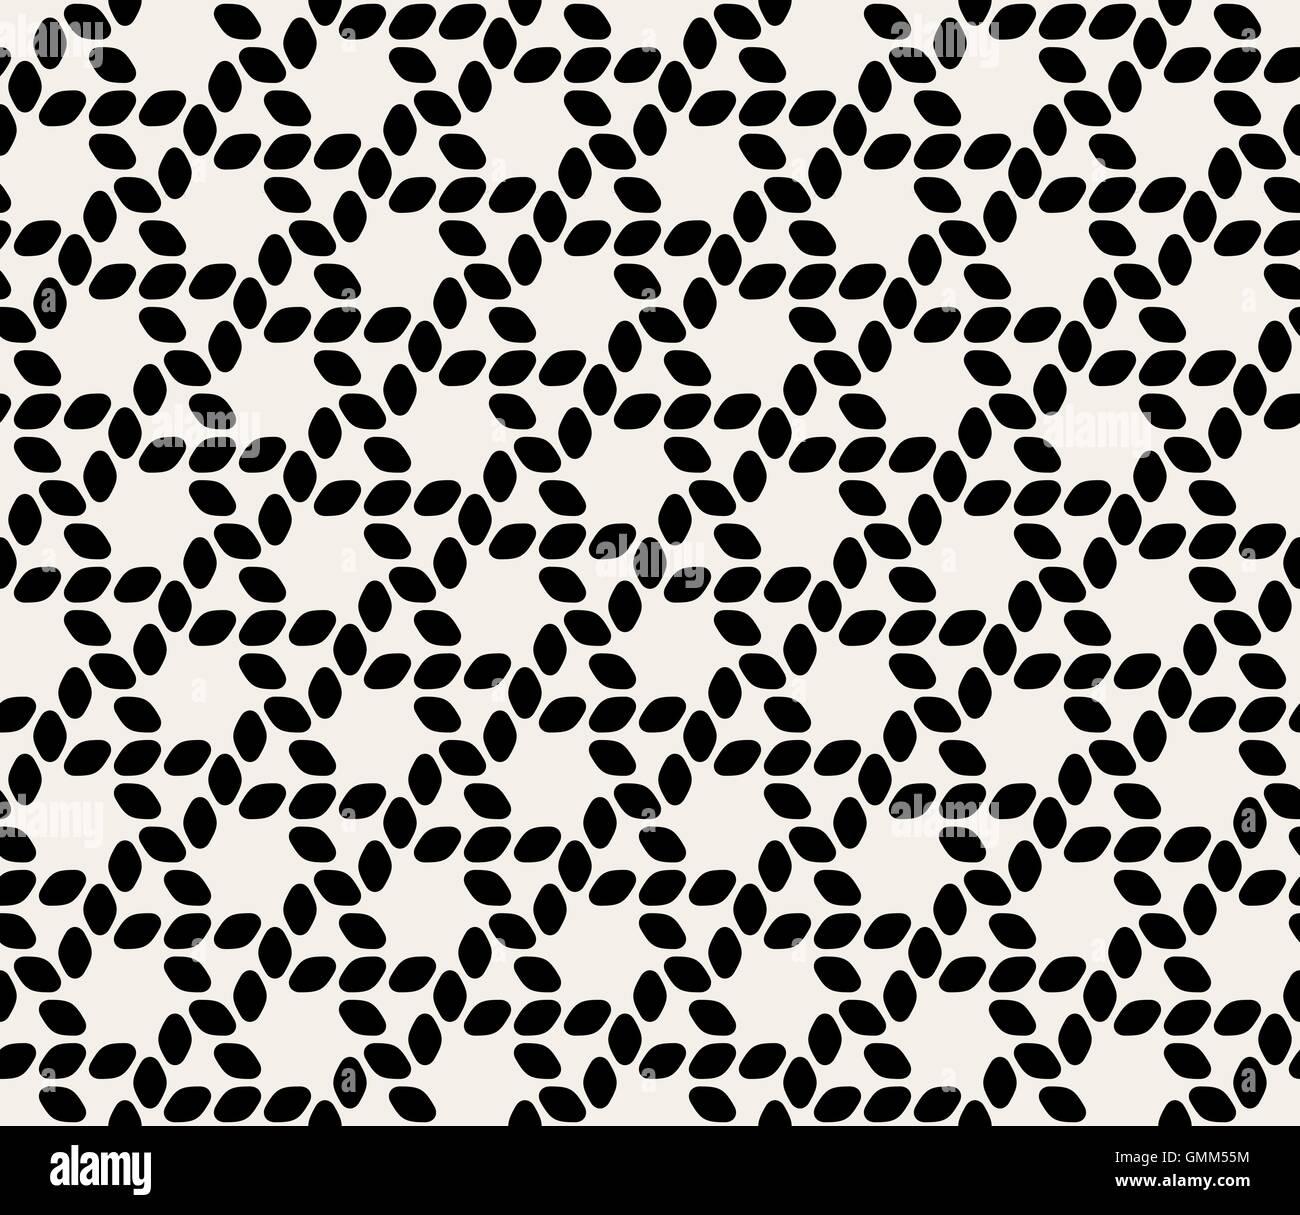 Seamless Vector Ellipse Noir & Blanc arrondie hexagonale motif de lignes de corde Photo Stock